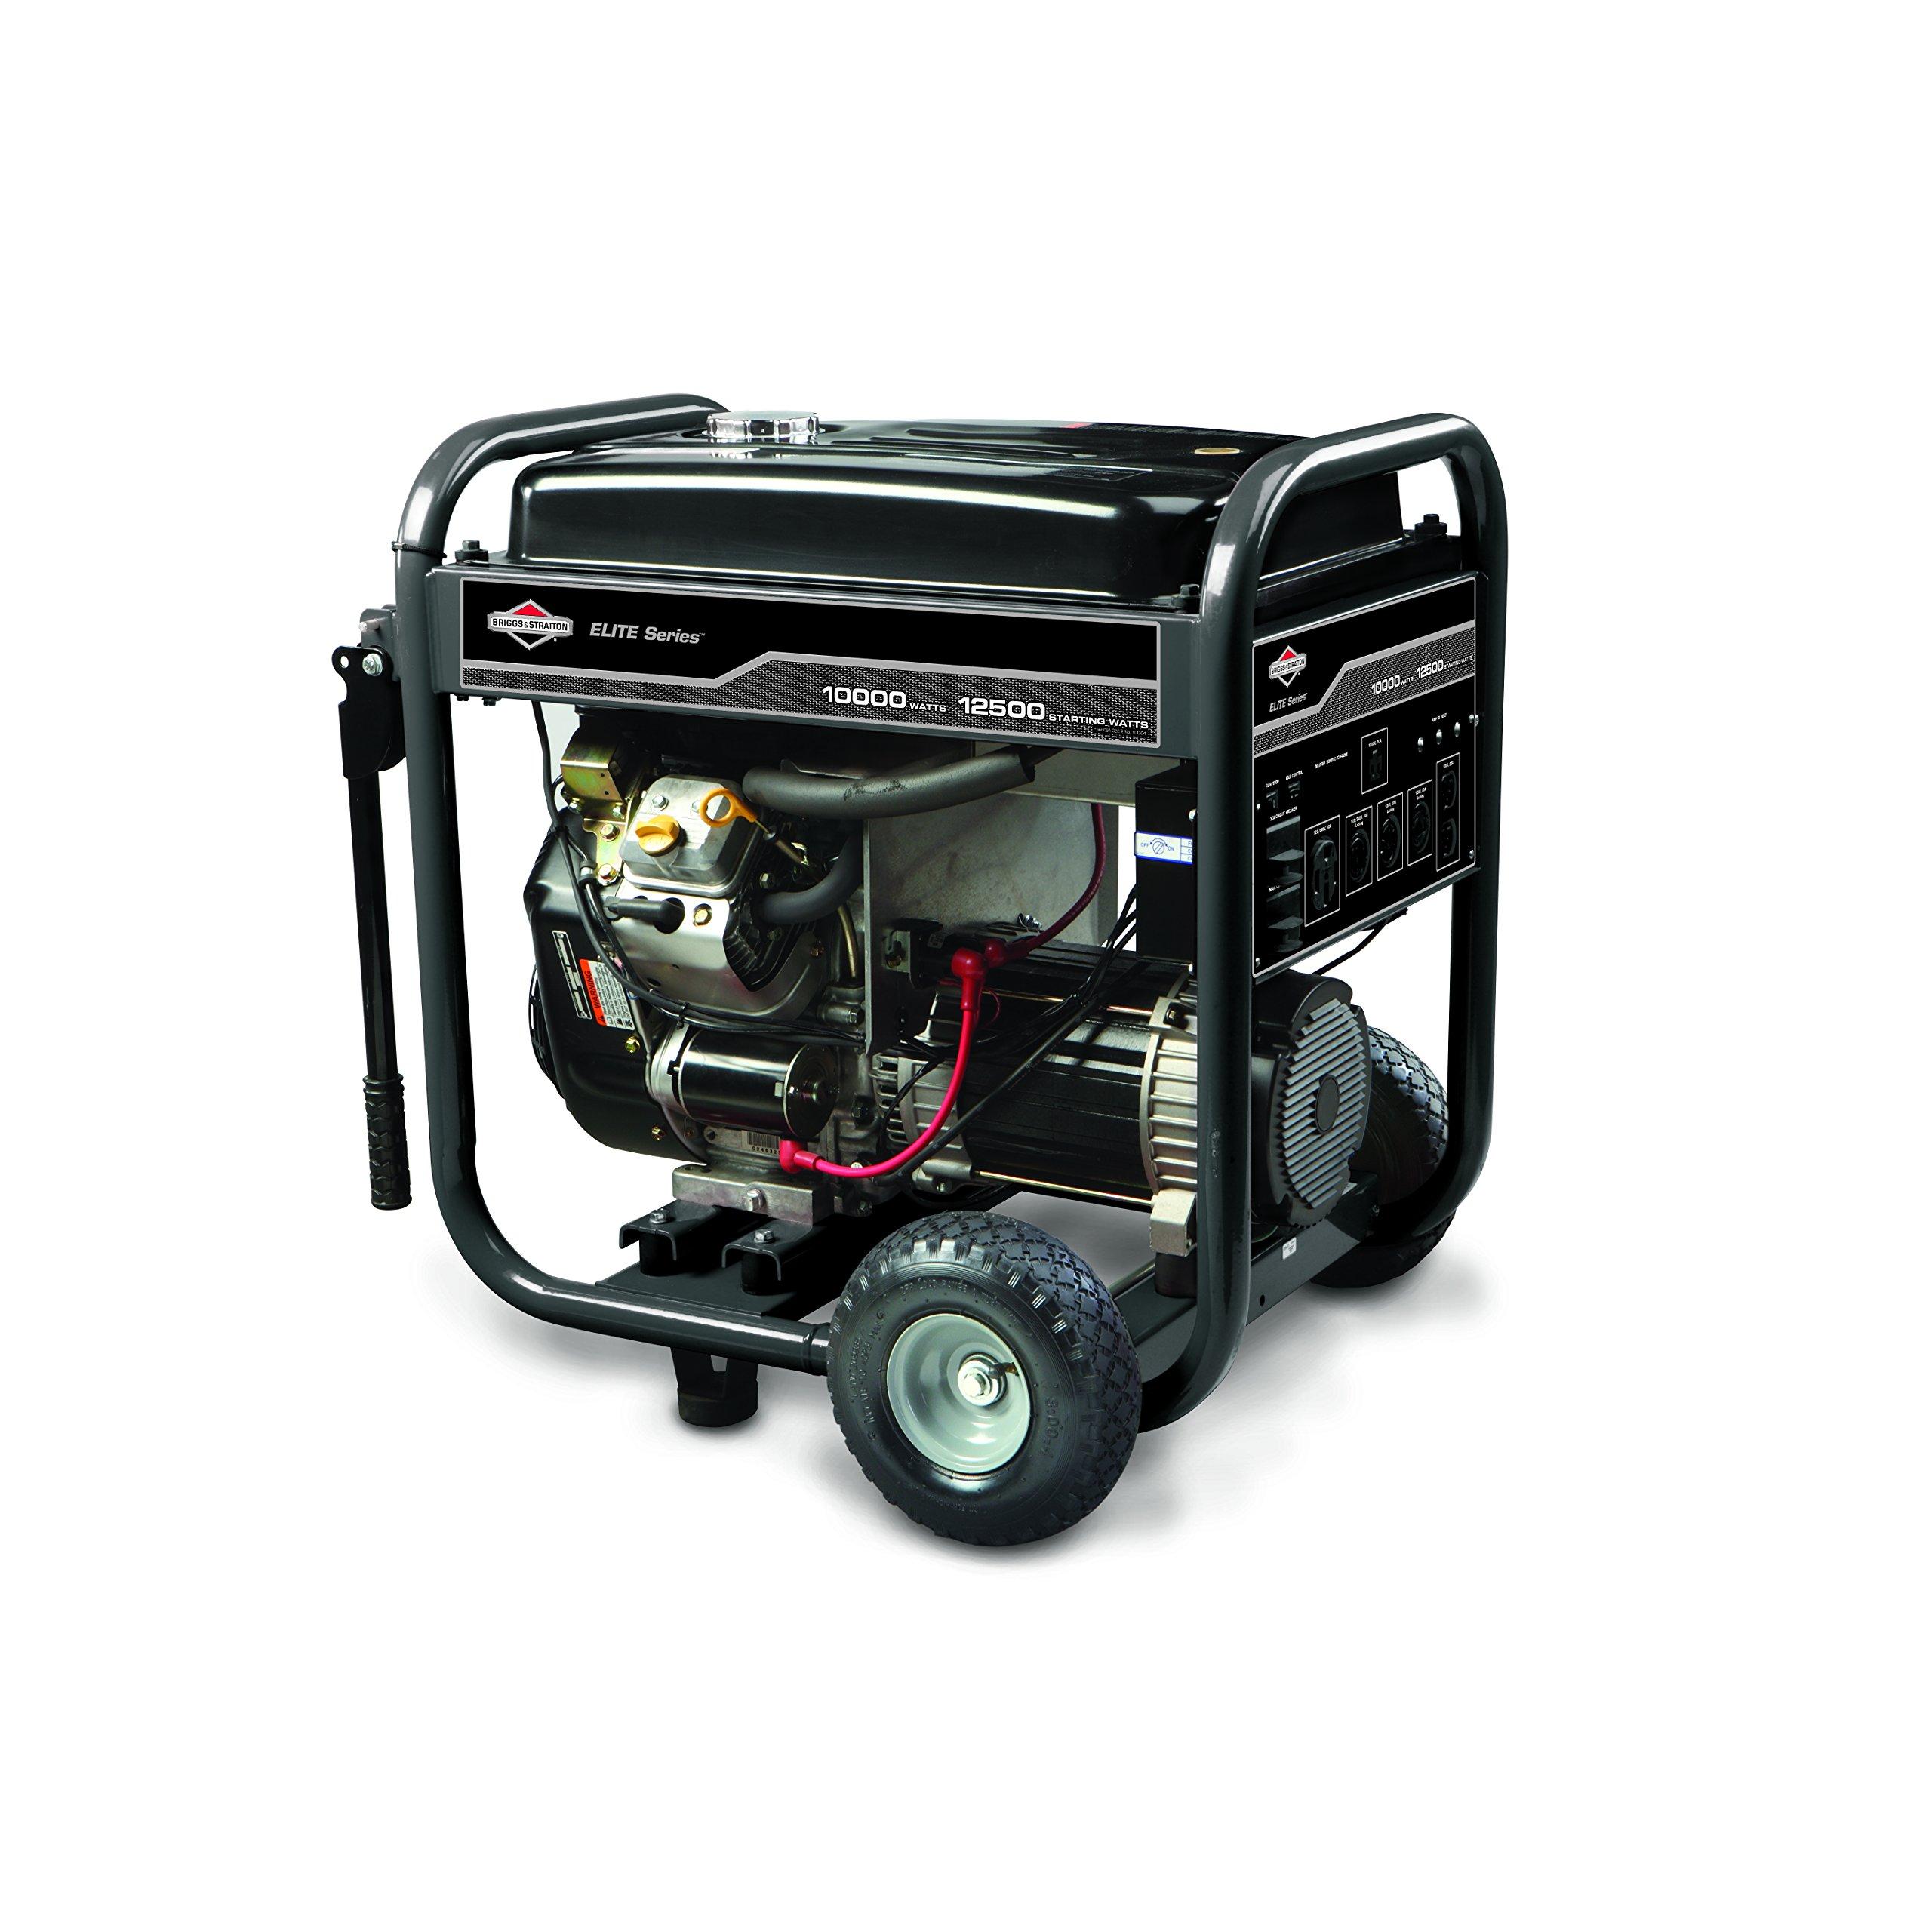 Portable Gas Powered Briggs Stratton Generator